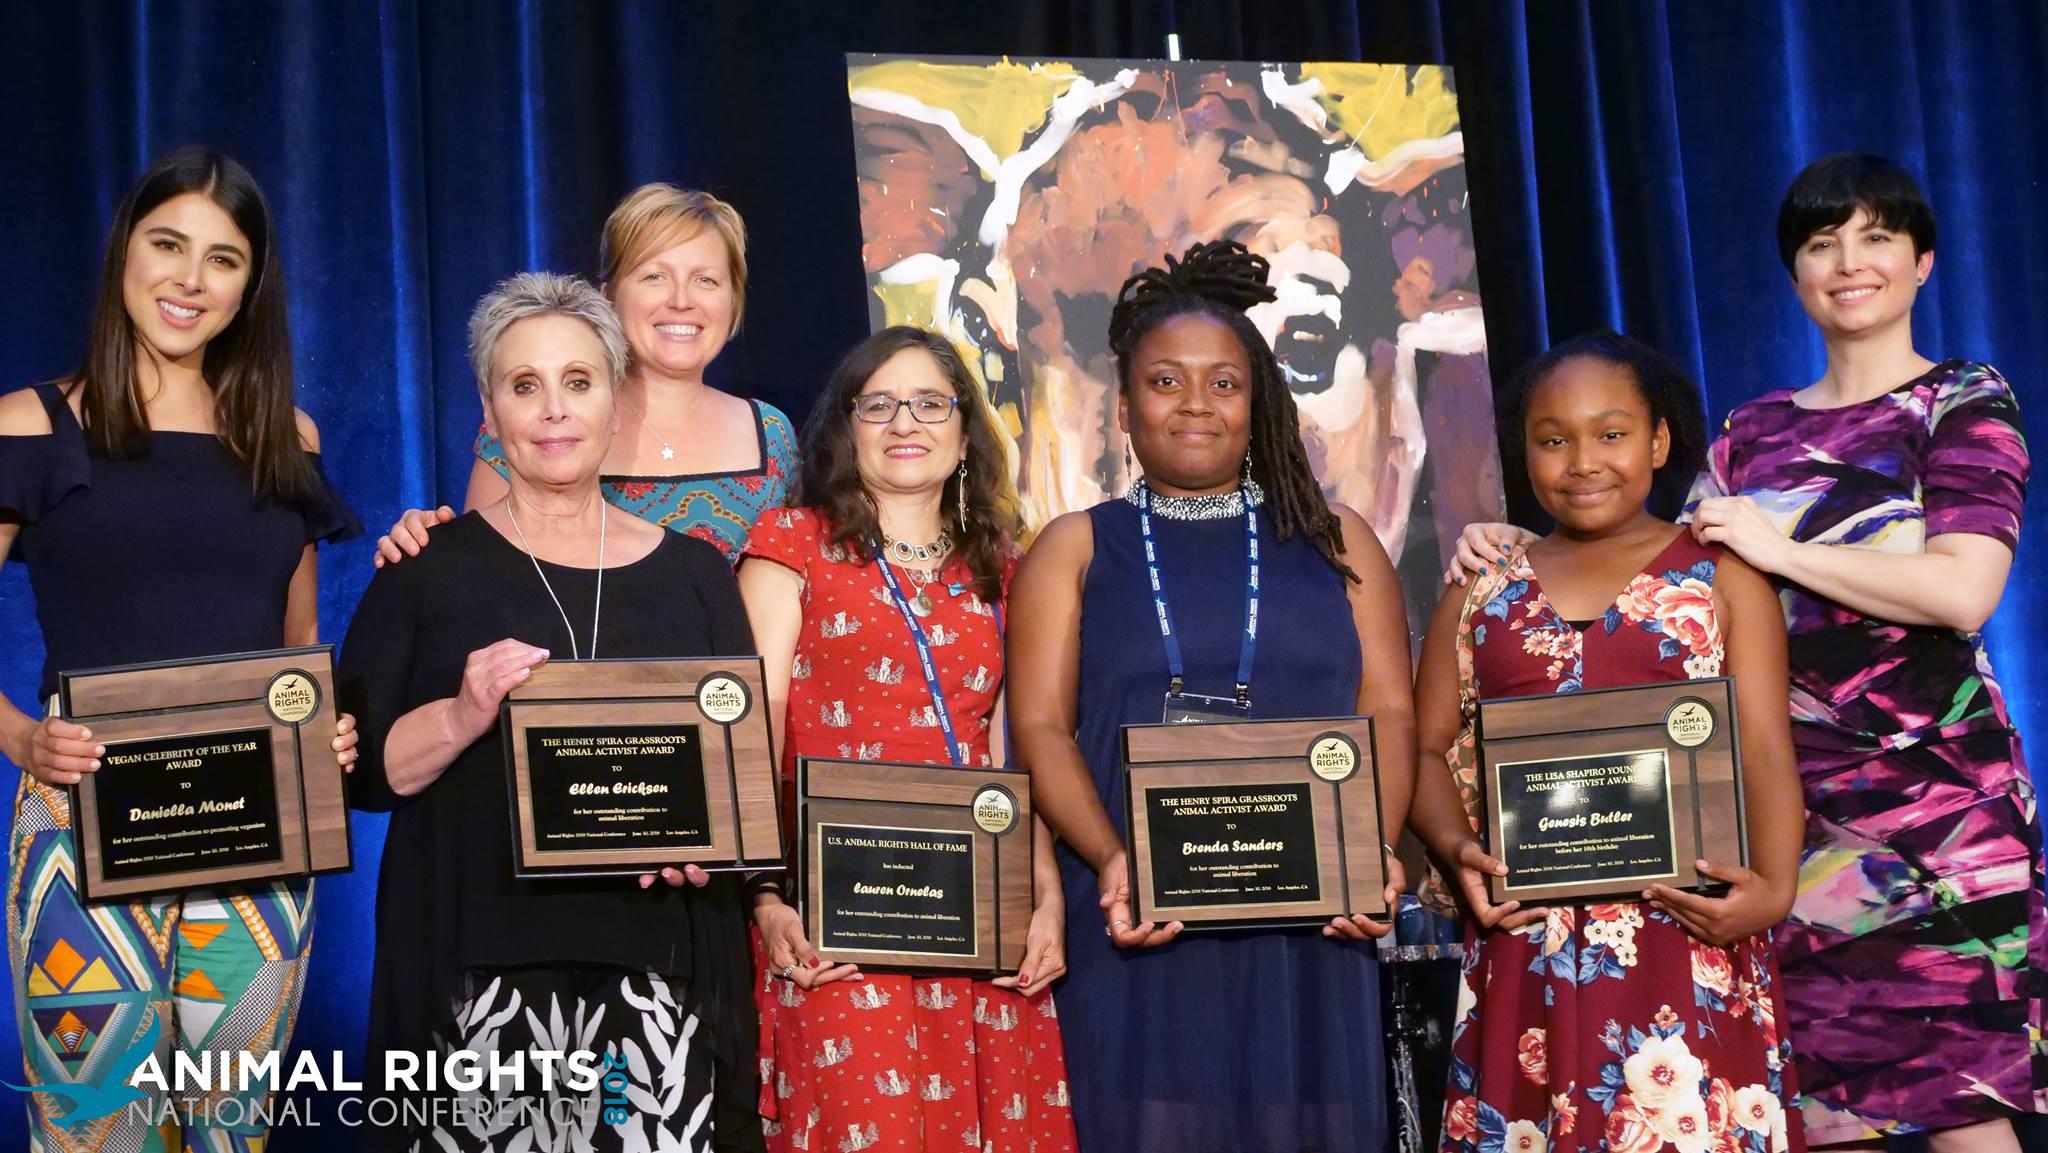 The Animal Rights National Conference 2018 award winners - Pictured left to right: Daniella Monet, Ellen Ericksen, Erica Meier, Lauren Ornelas, Brenda Sanders, Genesis Butler, Dawn L. Moncrief